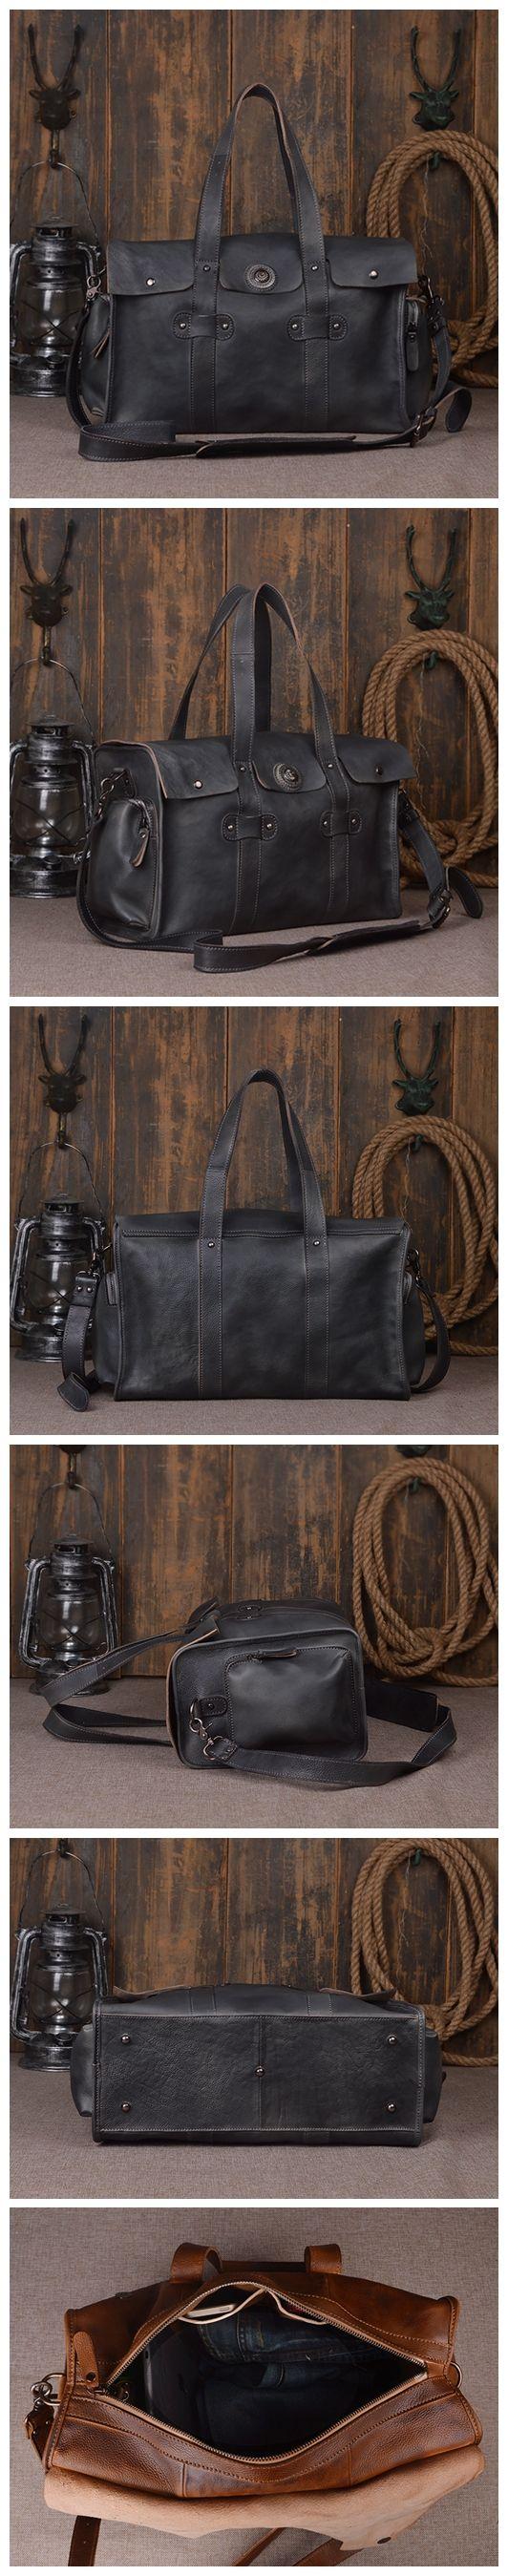 "Mens Leather Travel Bag Business Travel Luggage Bag 9035 Model Number: 9035 Dimensions: 16.5""L x 6.7""W x 9.8""H / 42cm(L) x 17cm(W) x 25cm(H) Weight: 3.5 lb / 1.6kg Hardware: Brass Hardware Shoulder St"